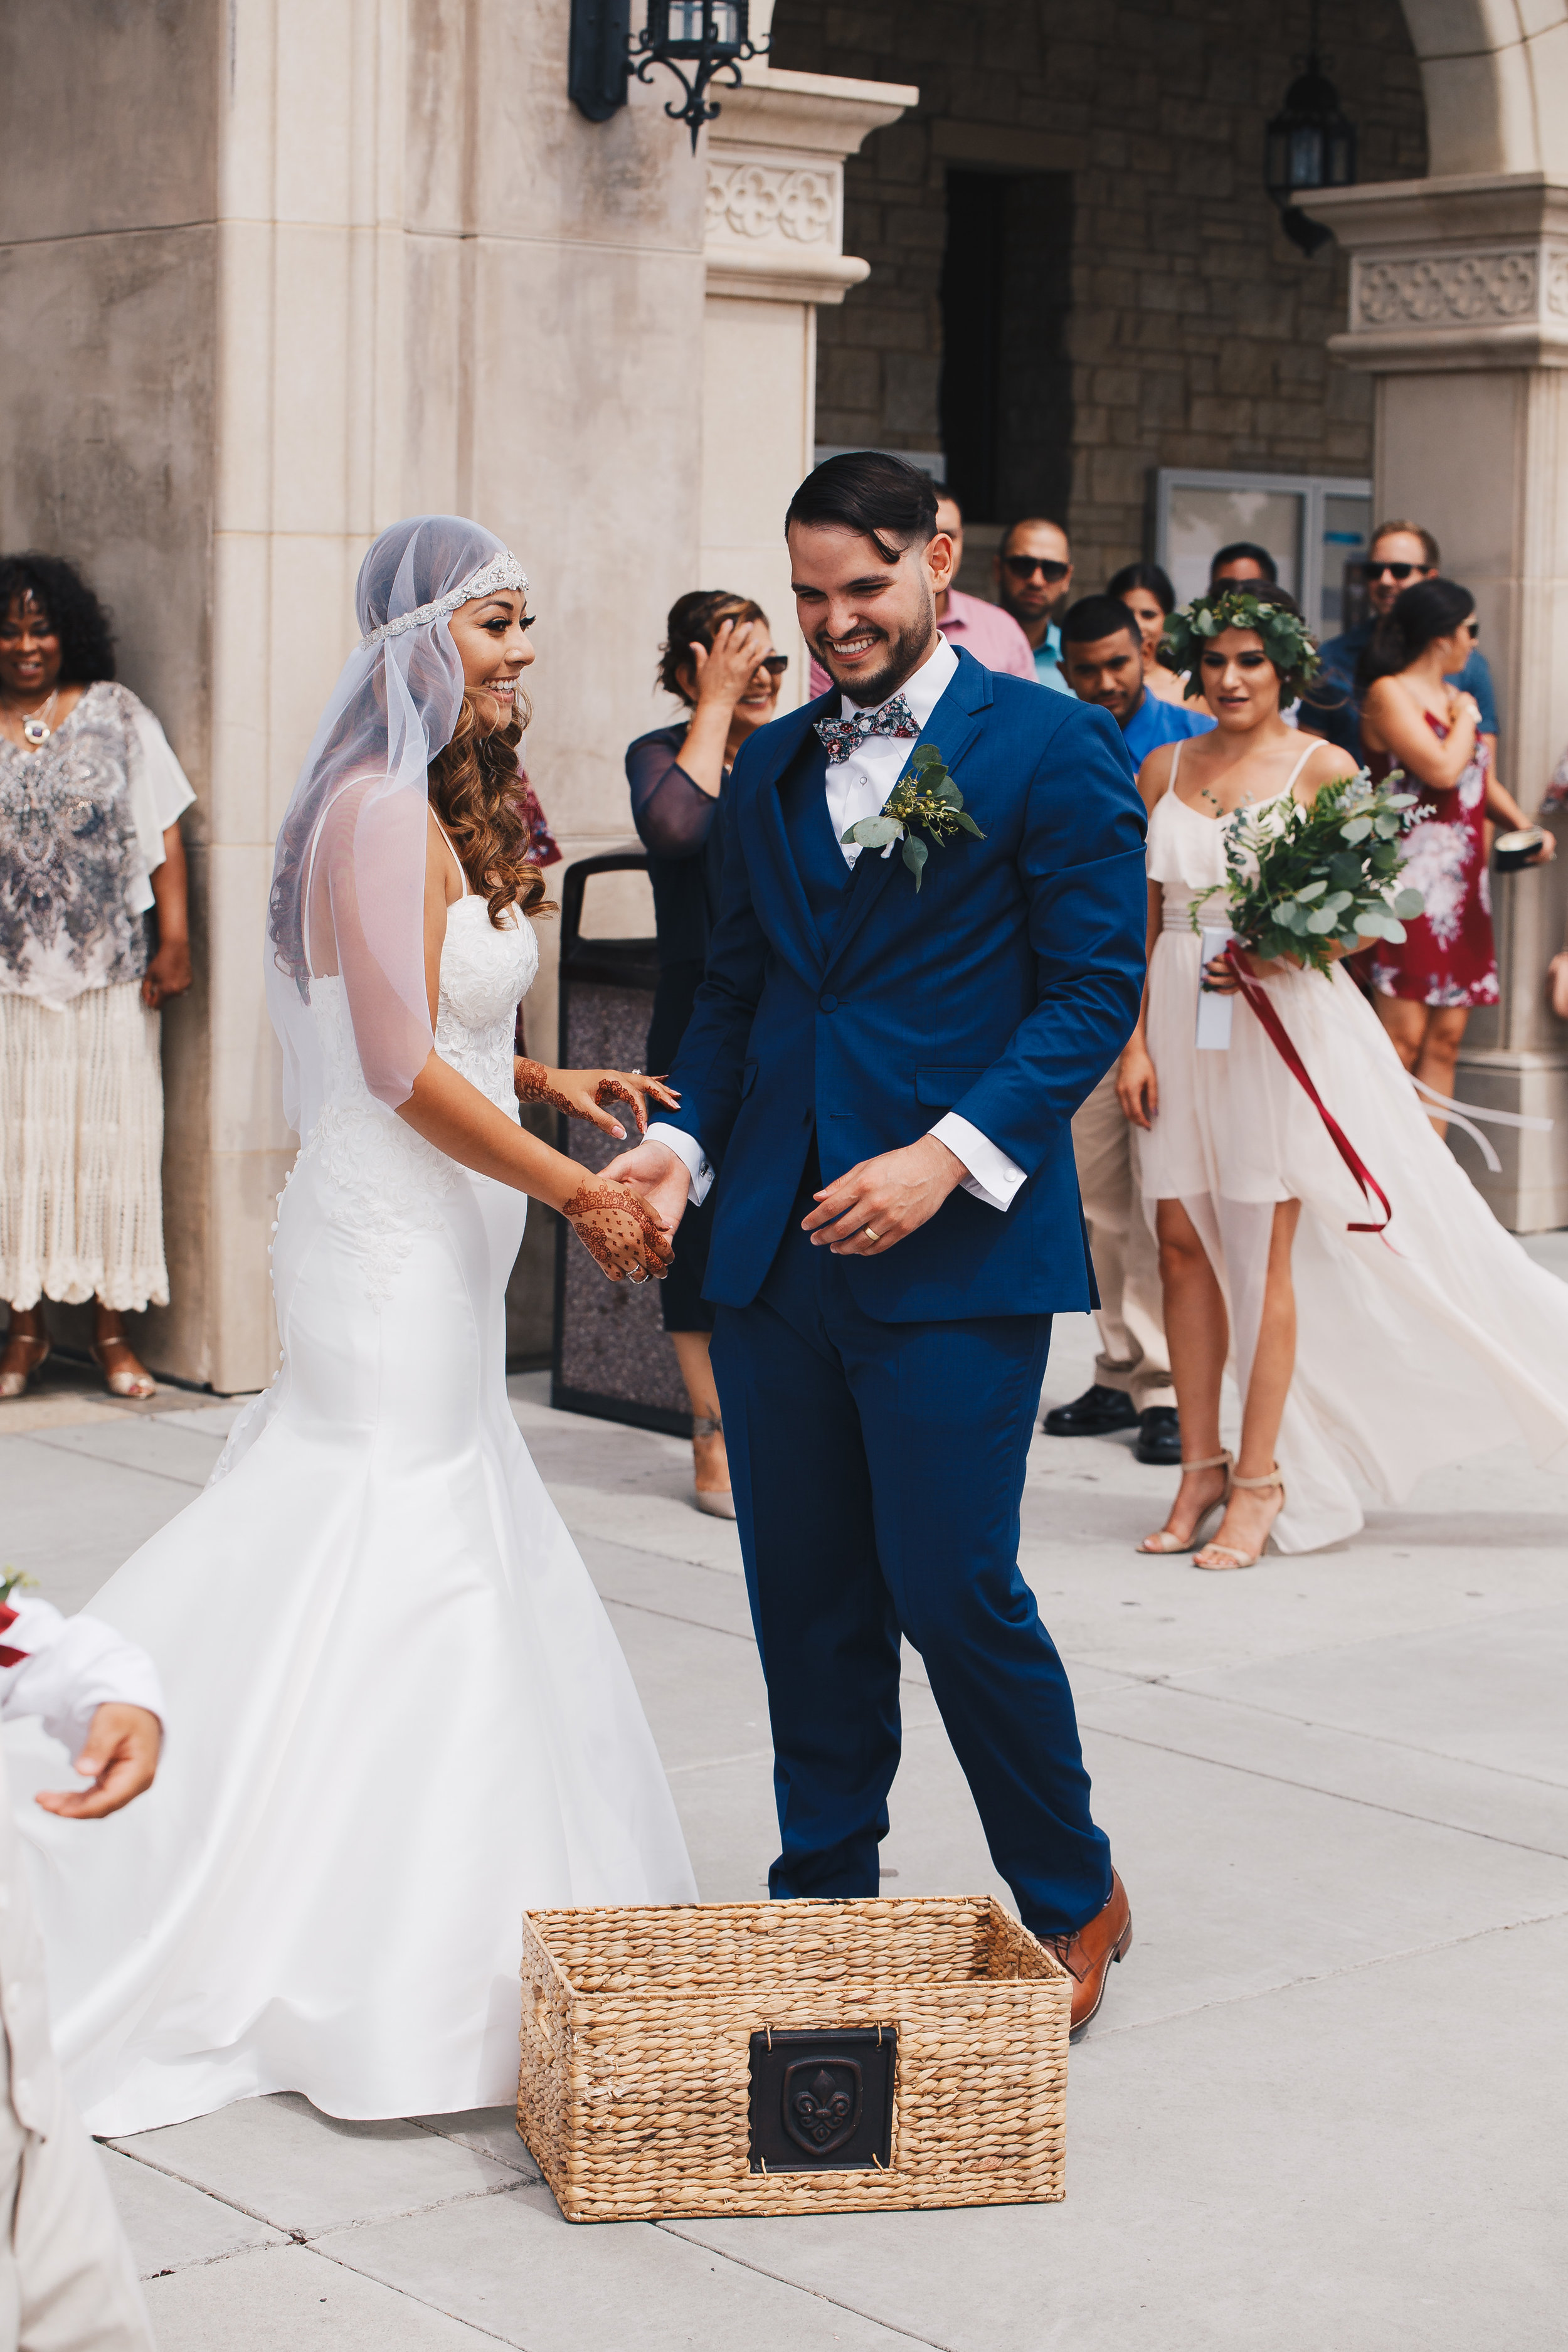 Veronica & Adrian Wedding 24 (1 of 1).jpg